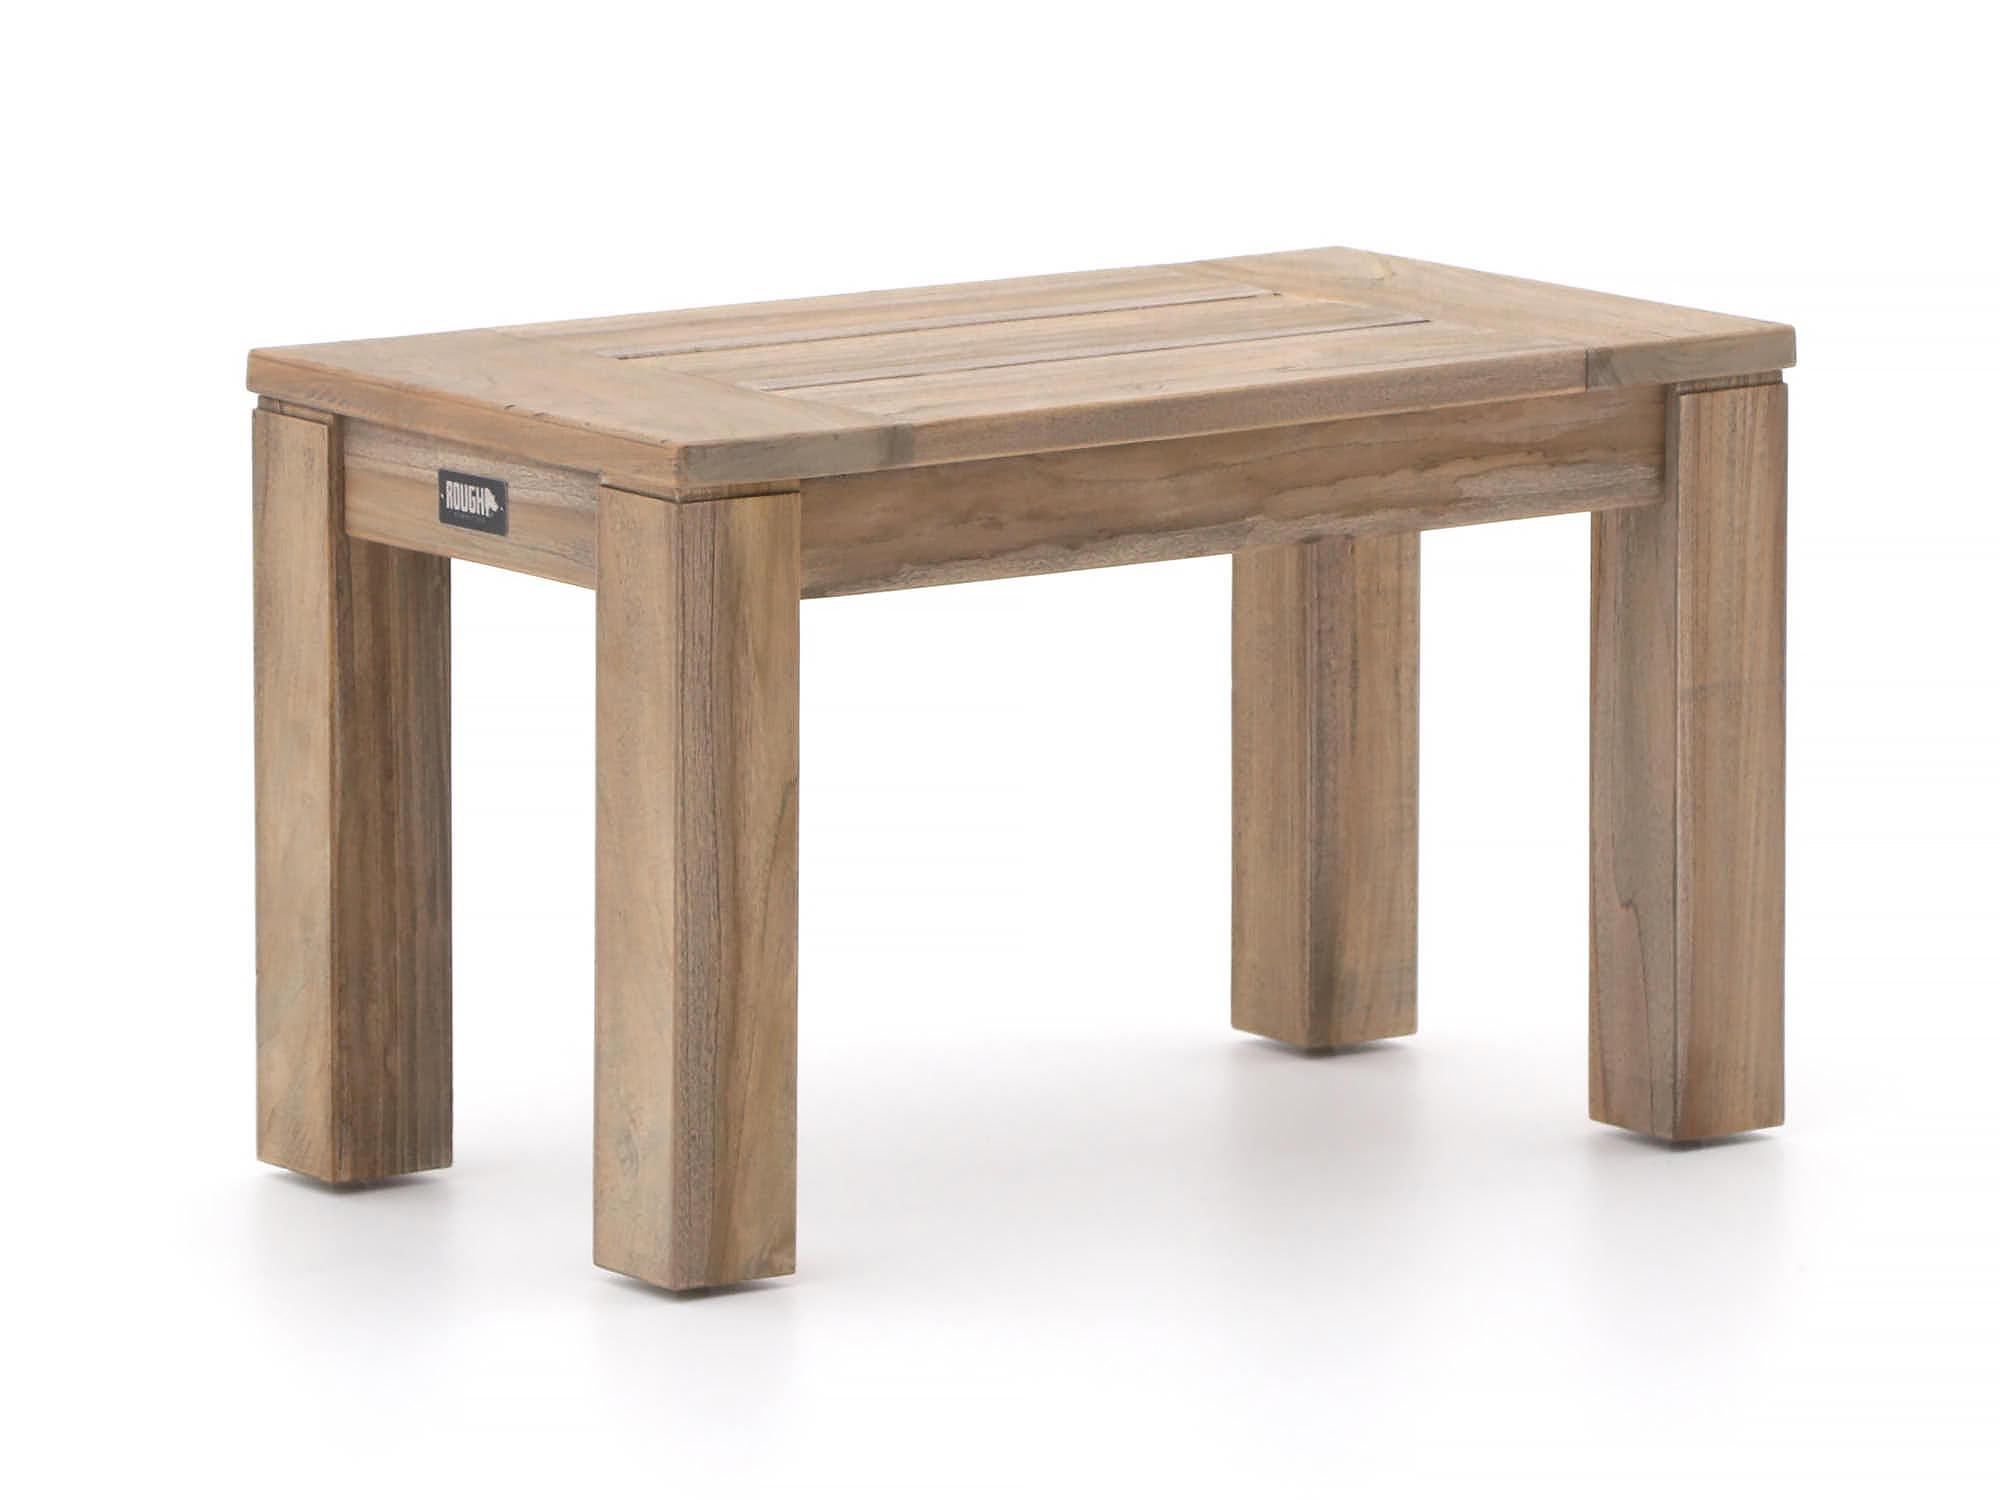 ROUGH-X picknickbank 75x42x45cm - Laagste prijsgarantie!